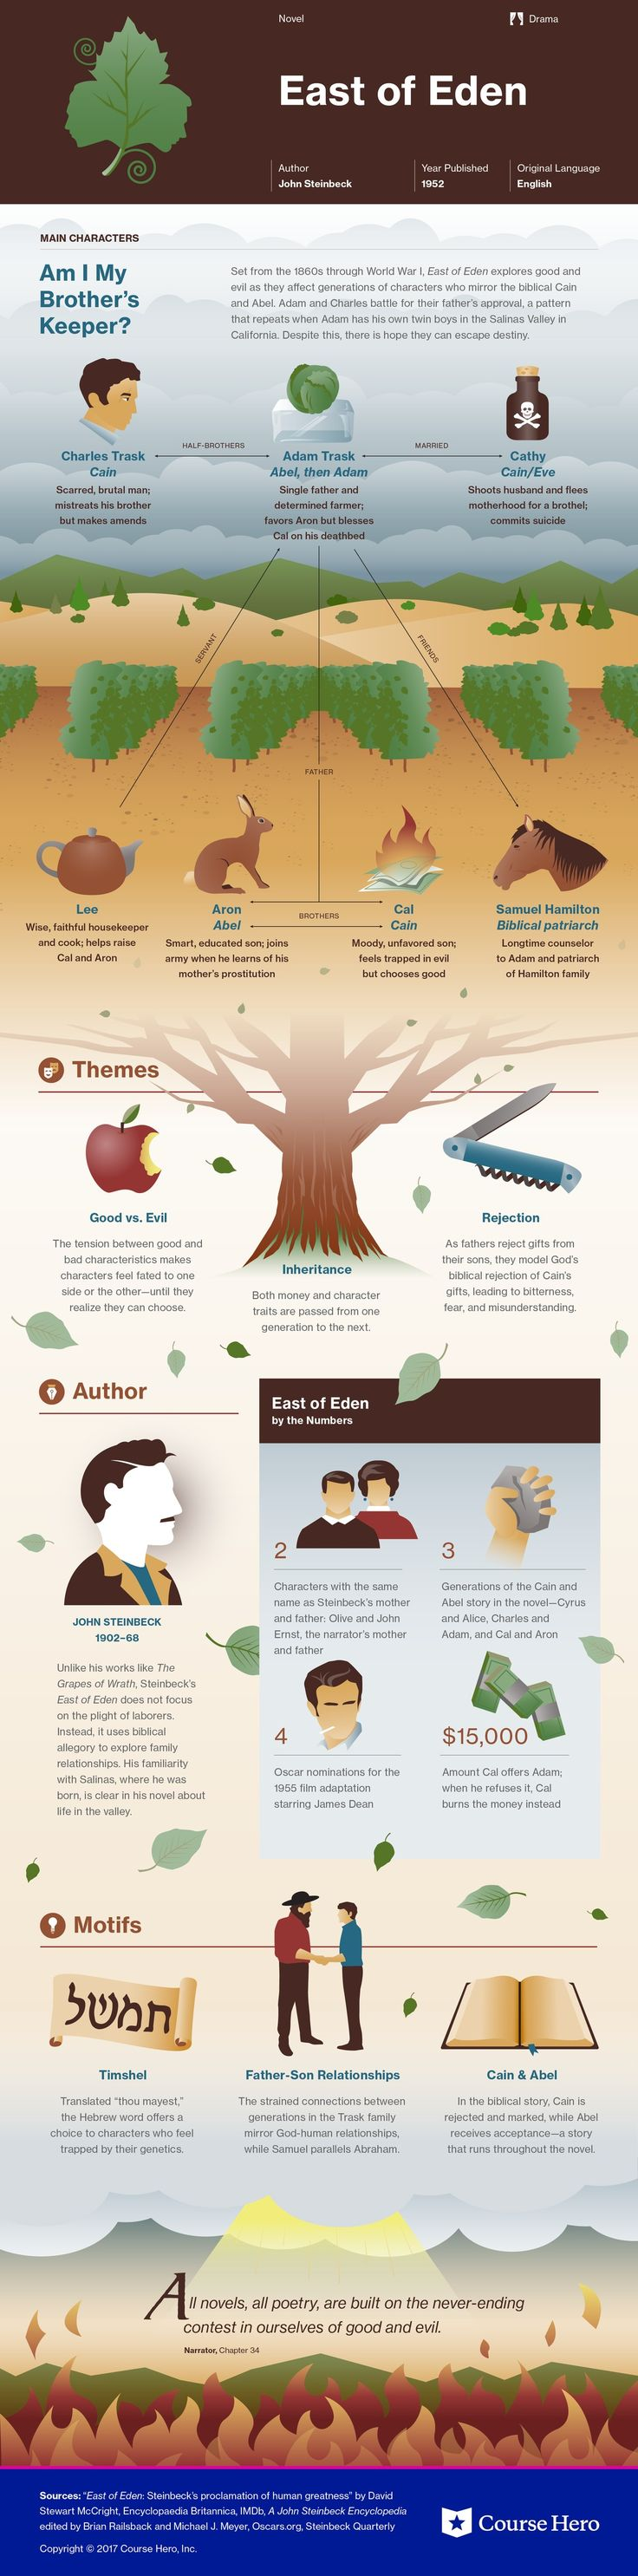 East of Eden infographic | Course Hero